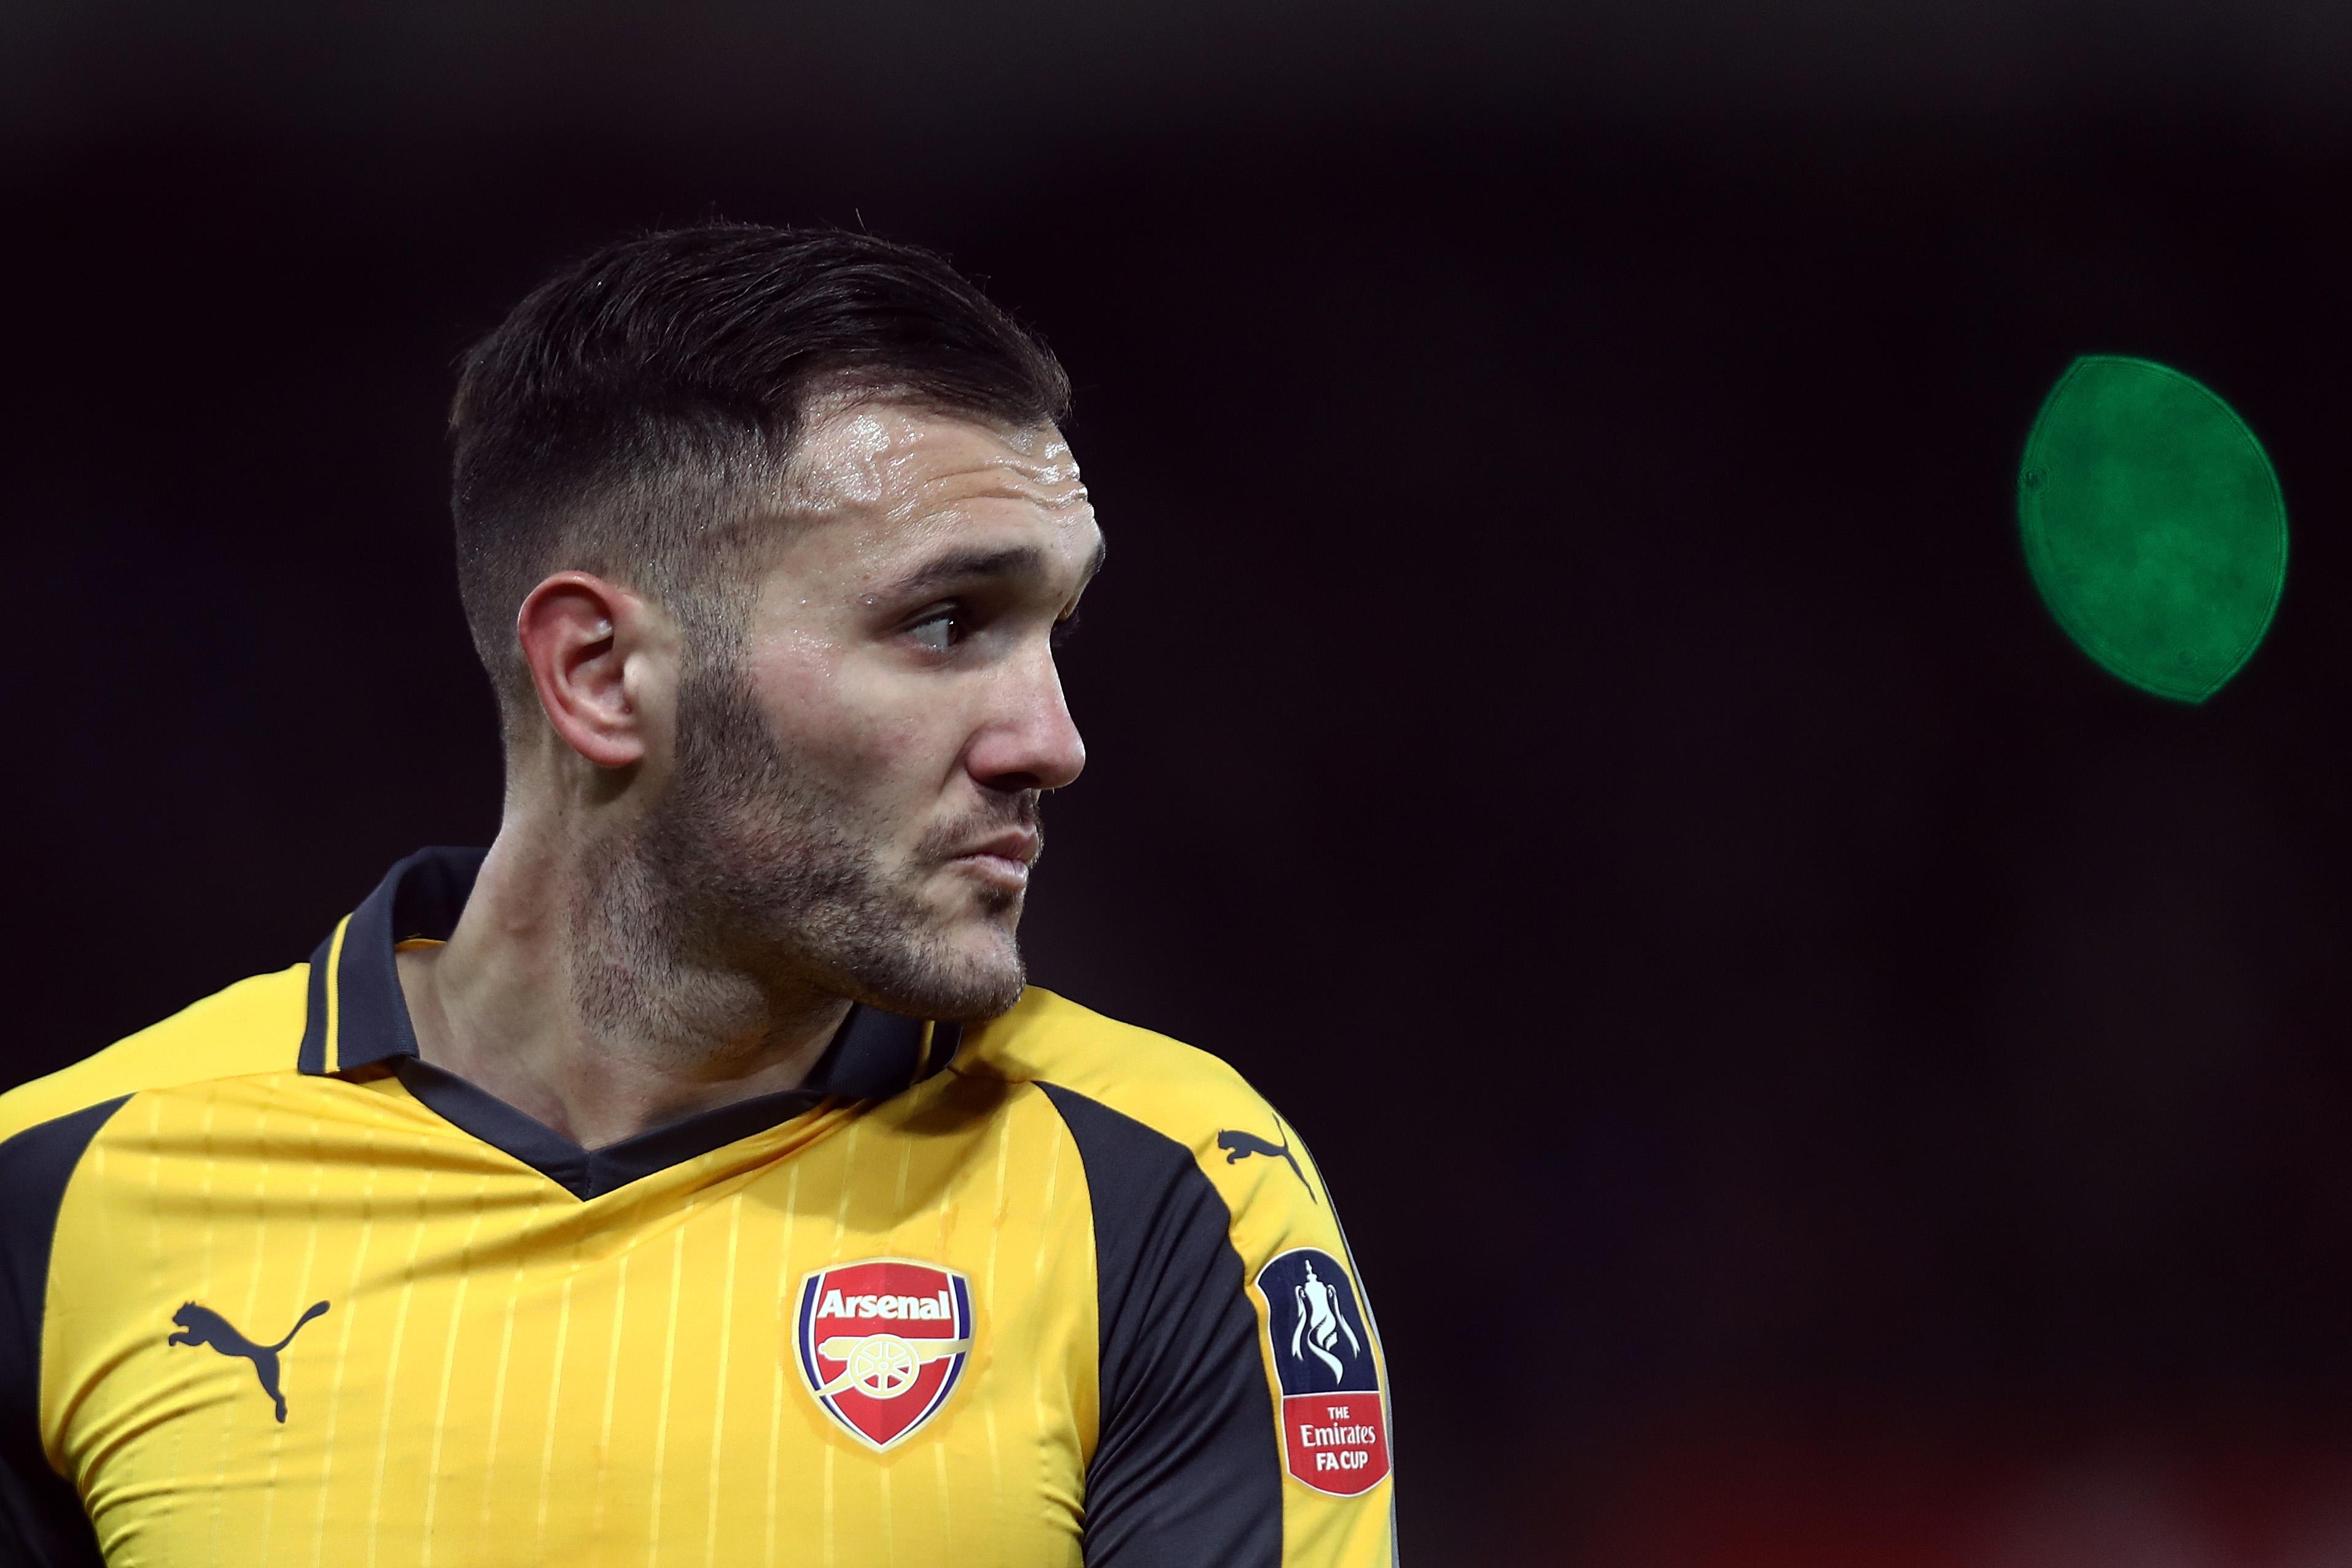 Arsenal ST Lucas Perez